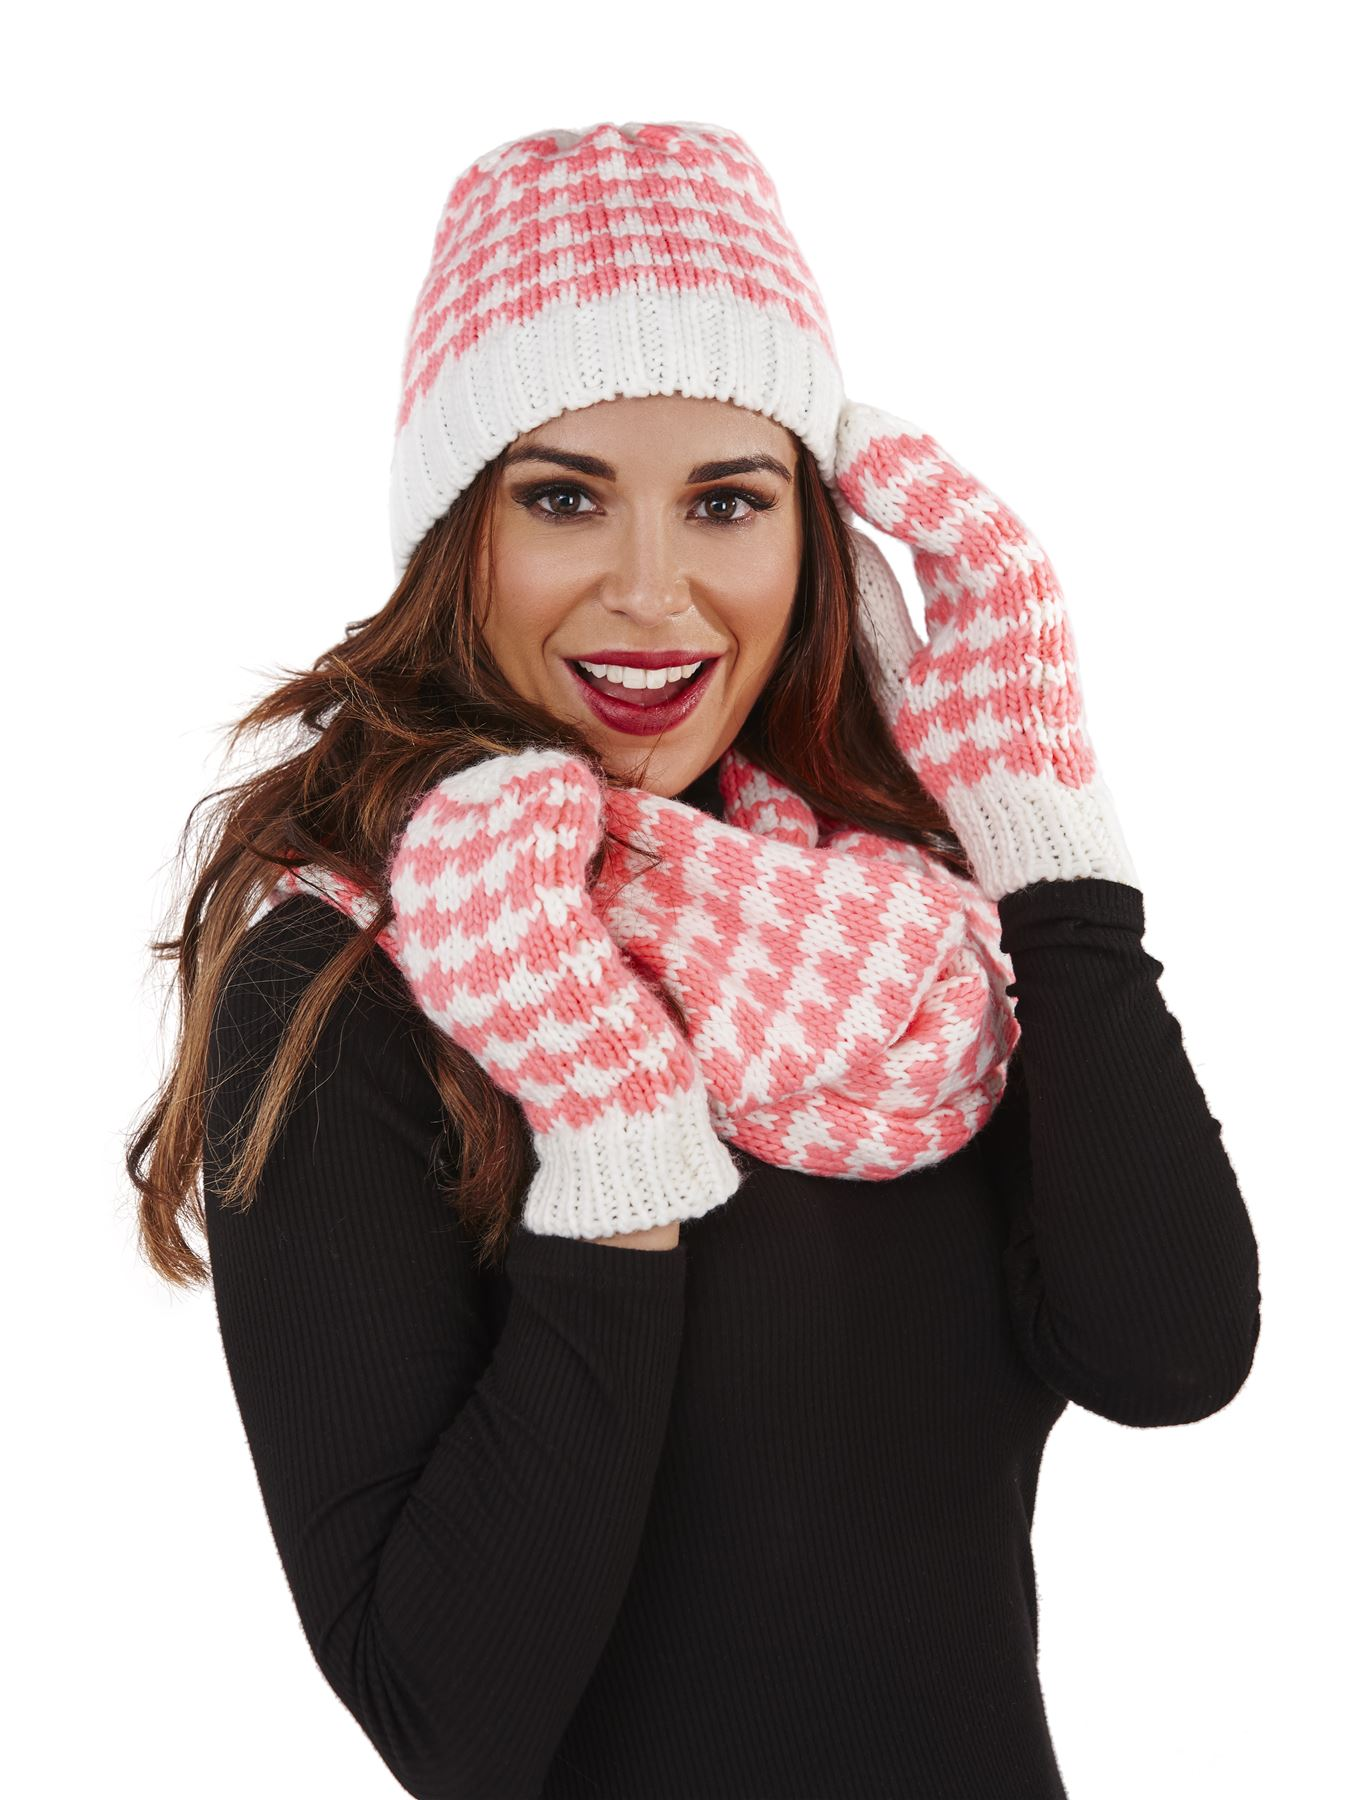 Ladies Womens Knitted Gloves Mittens Beanie Hat Snood